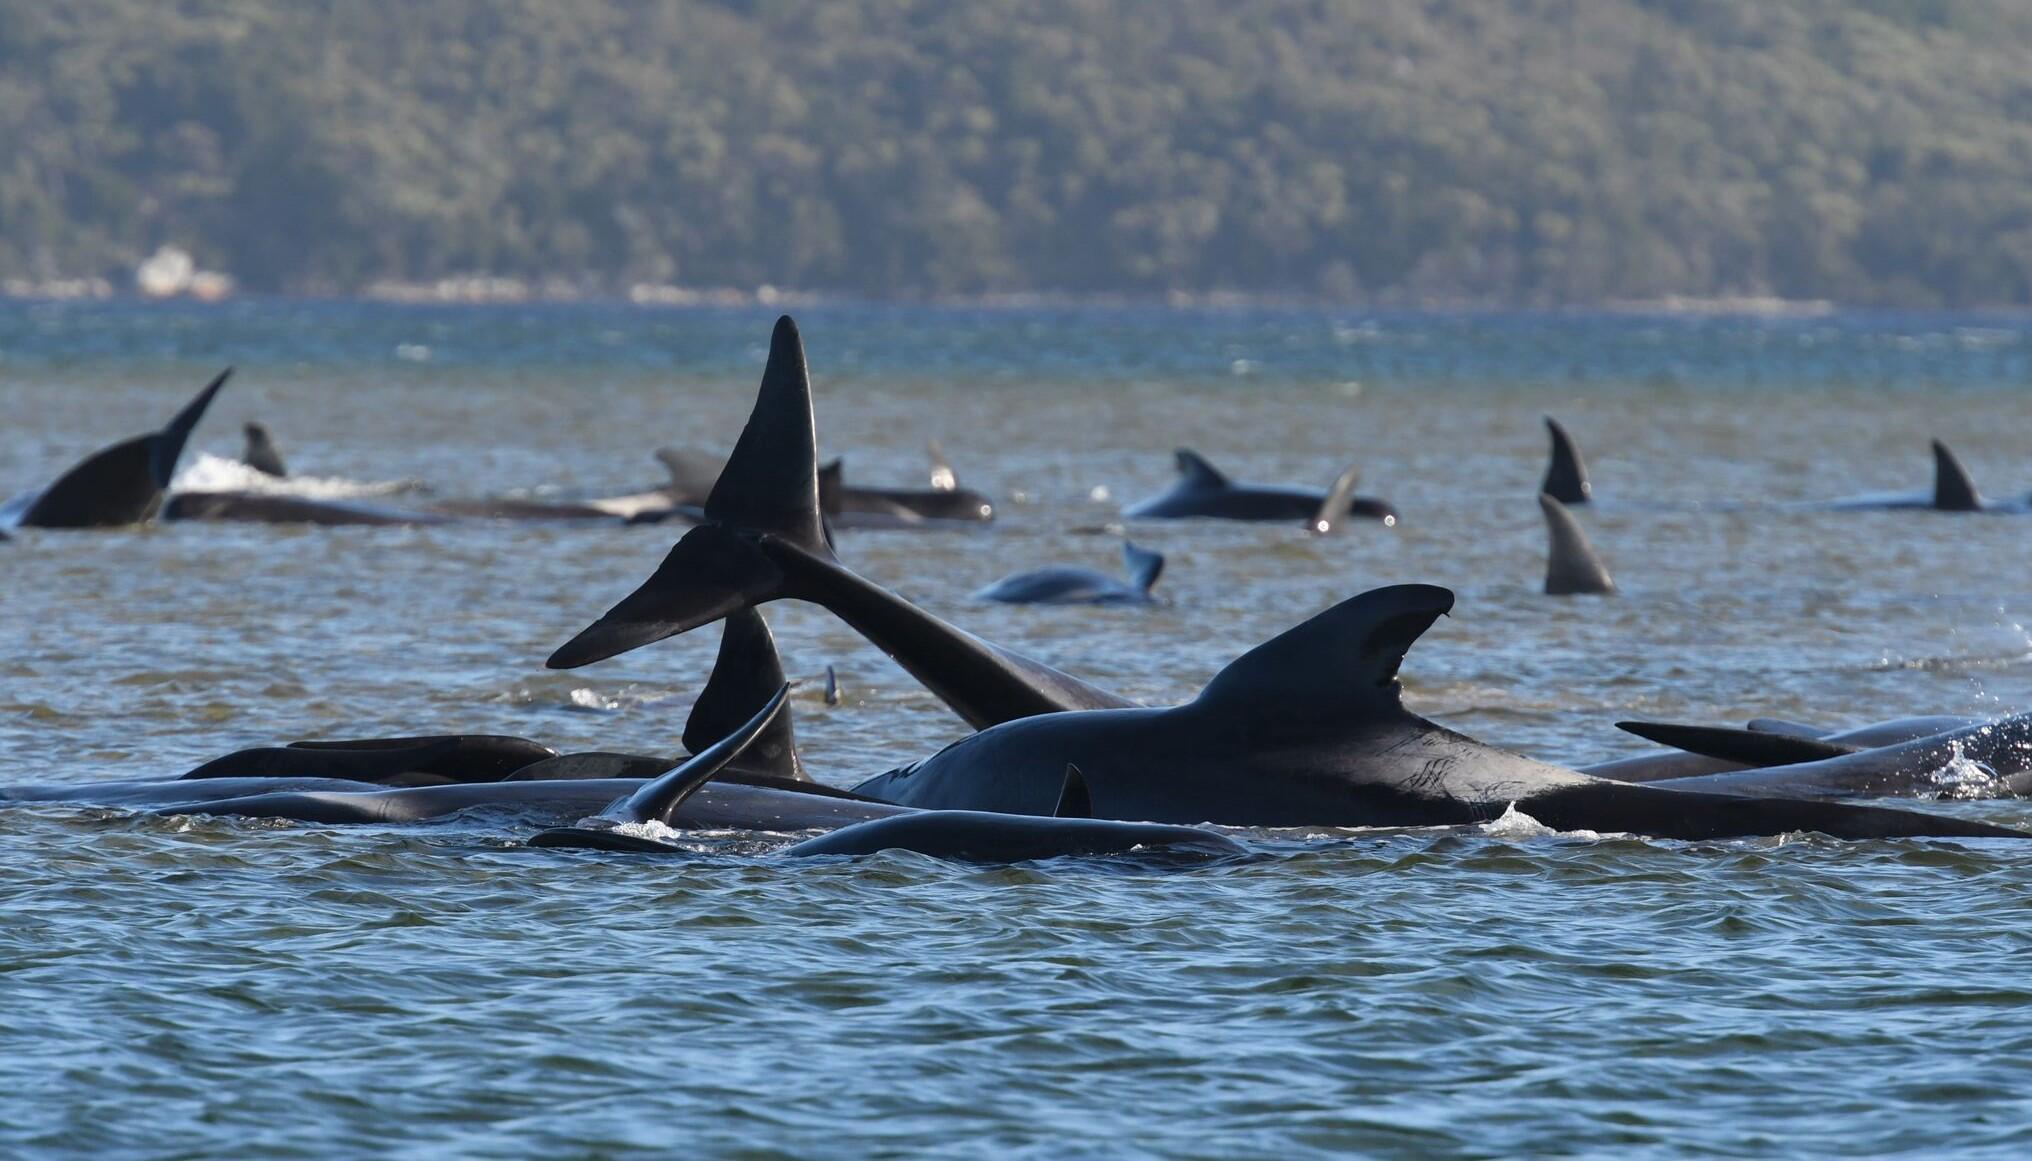 Weitere gestrandete Grindwale vor Küste Australiens entdeckt